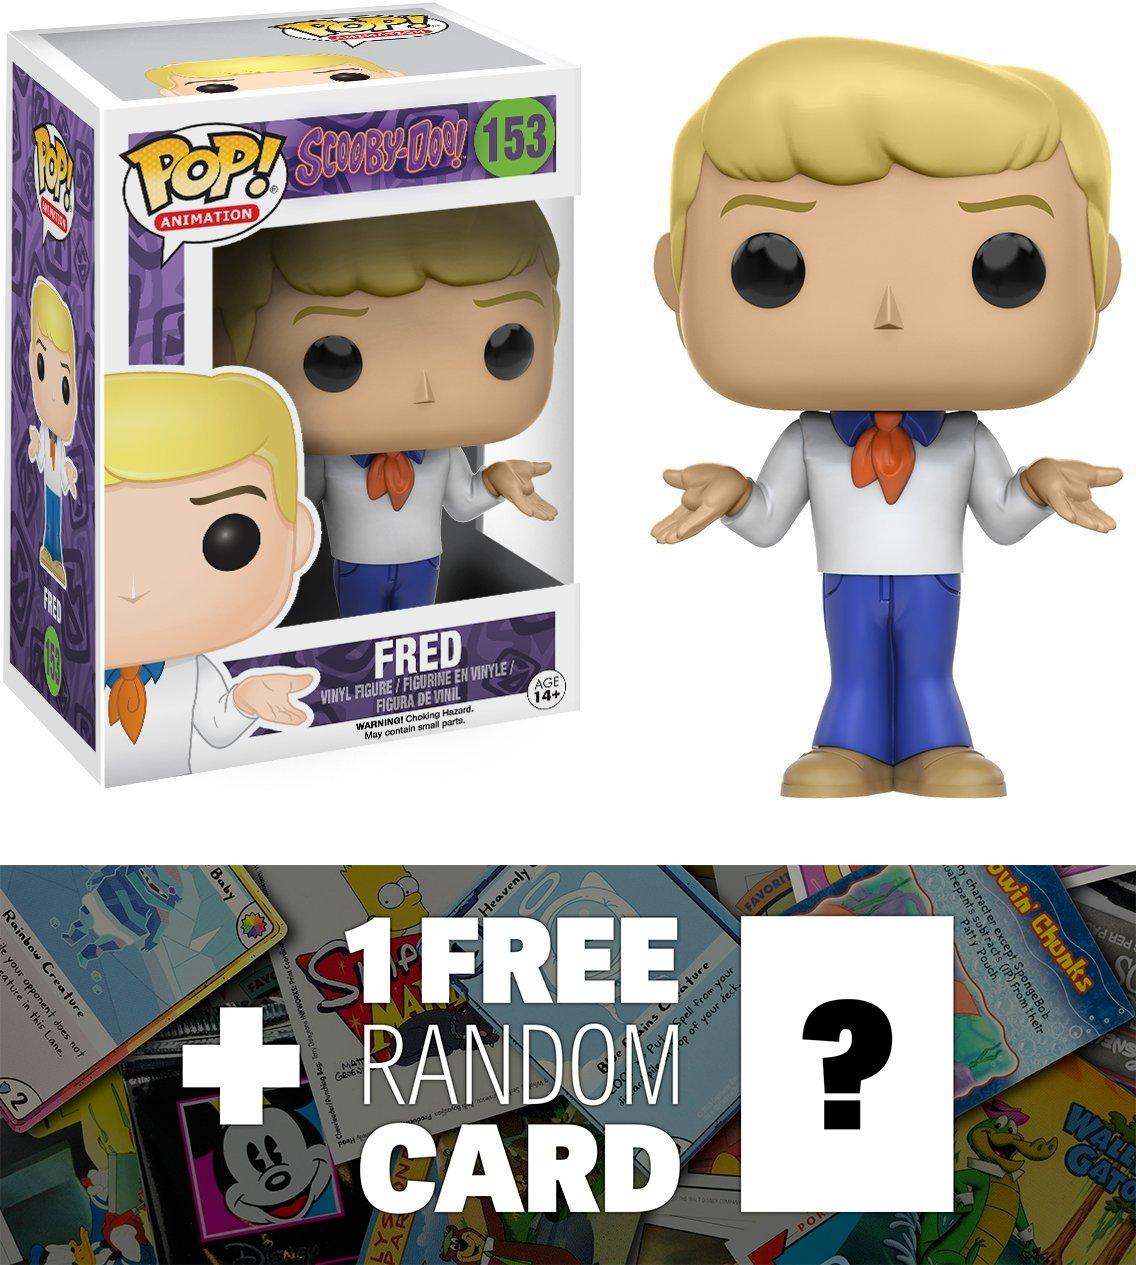 094287 x Vinyl Figure BCC9475I8 1 FREE American Cartoon Themed Trading Card Bundle Scooby-Doo Fred: Funko POP